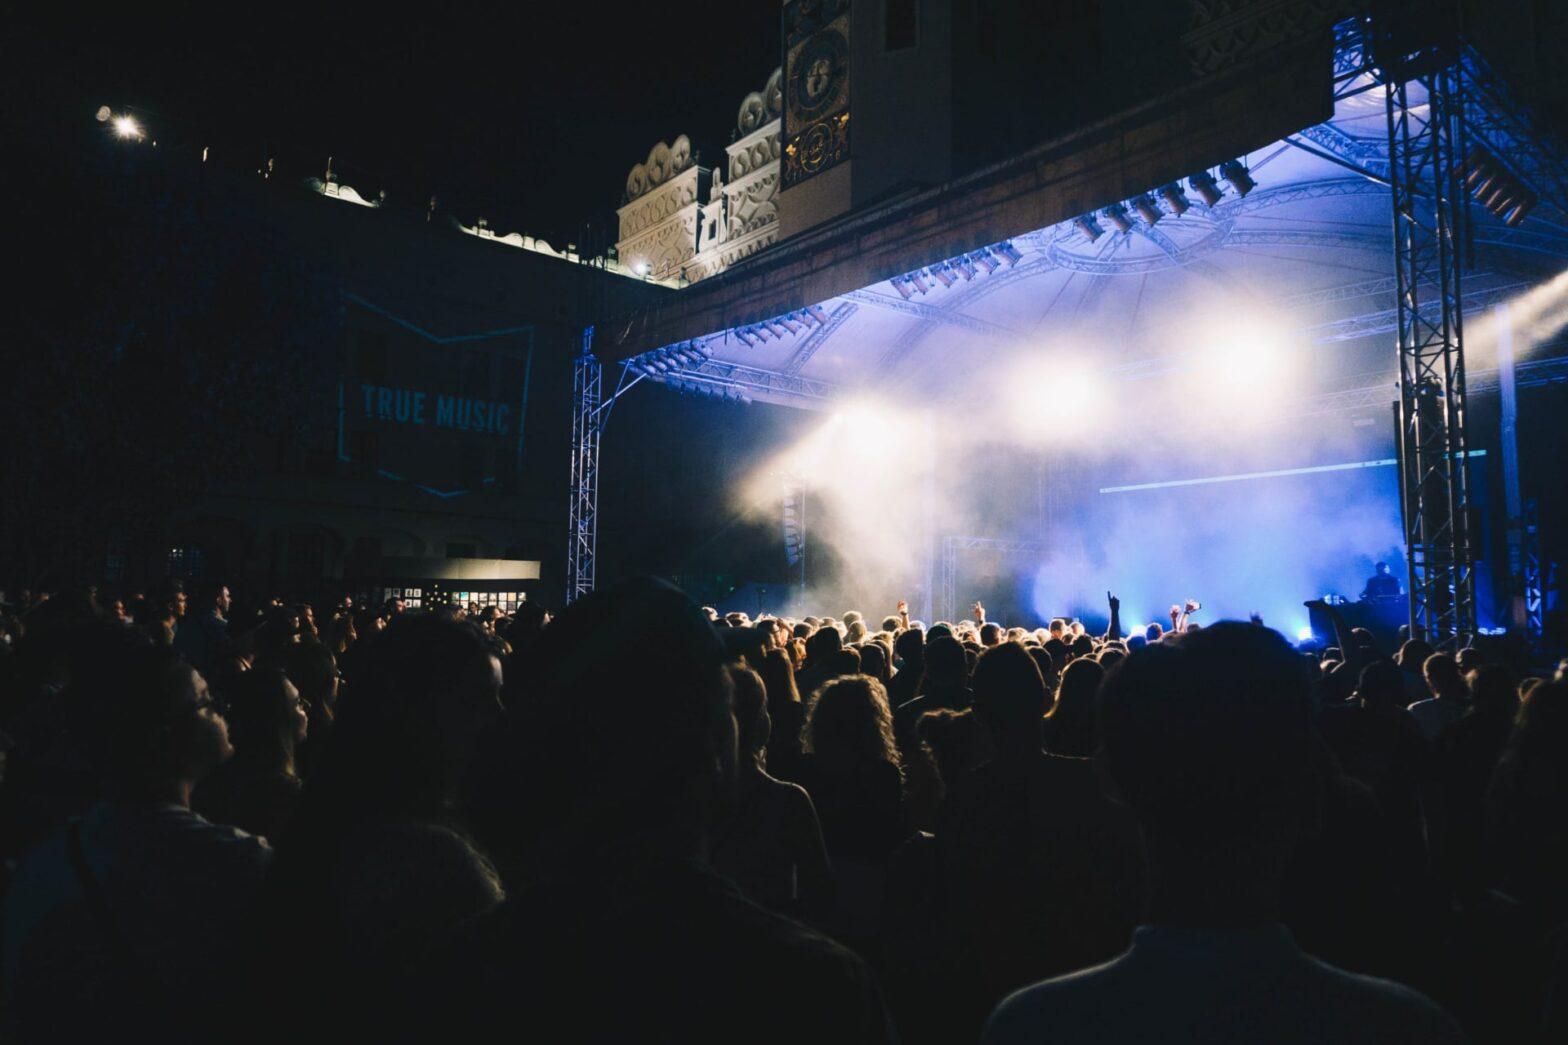 koncert PRO8L3M, Zamek Książąt Pomorskich, fot. Sebastian Cencyk